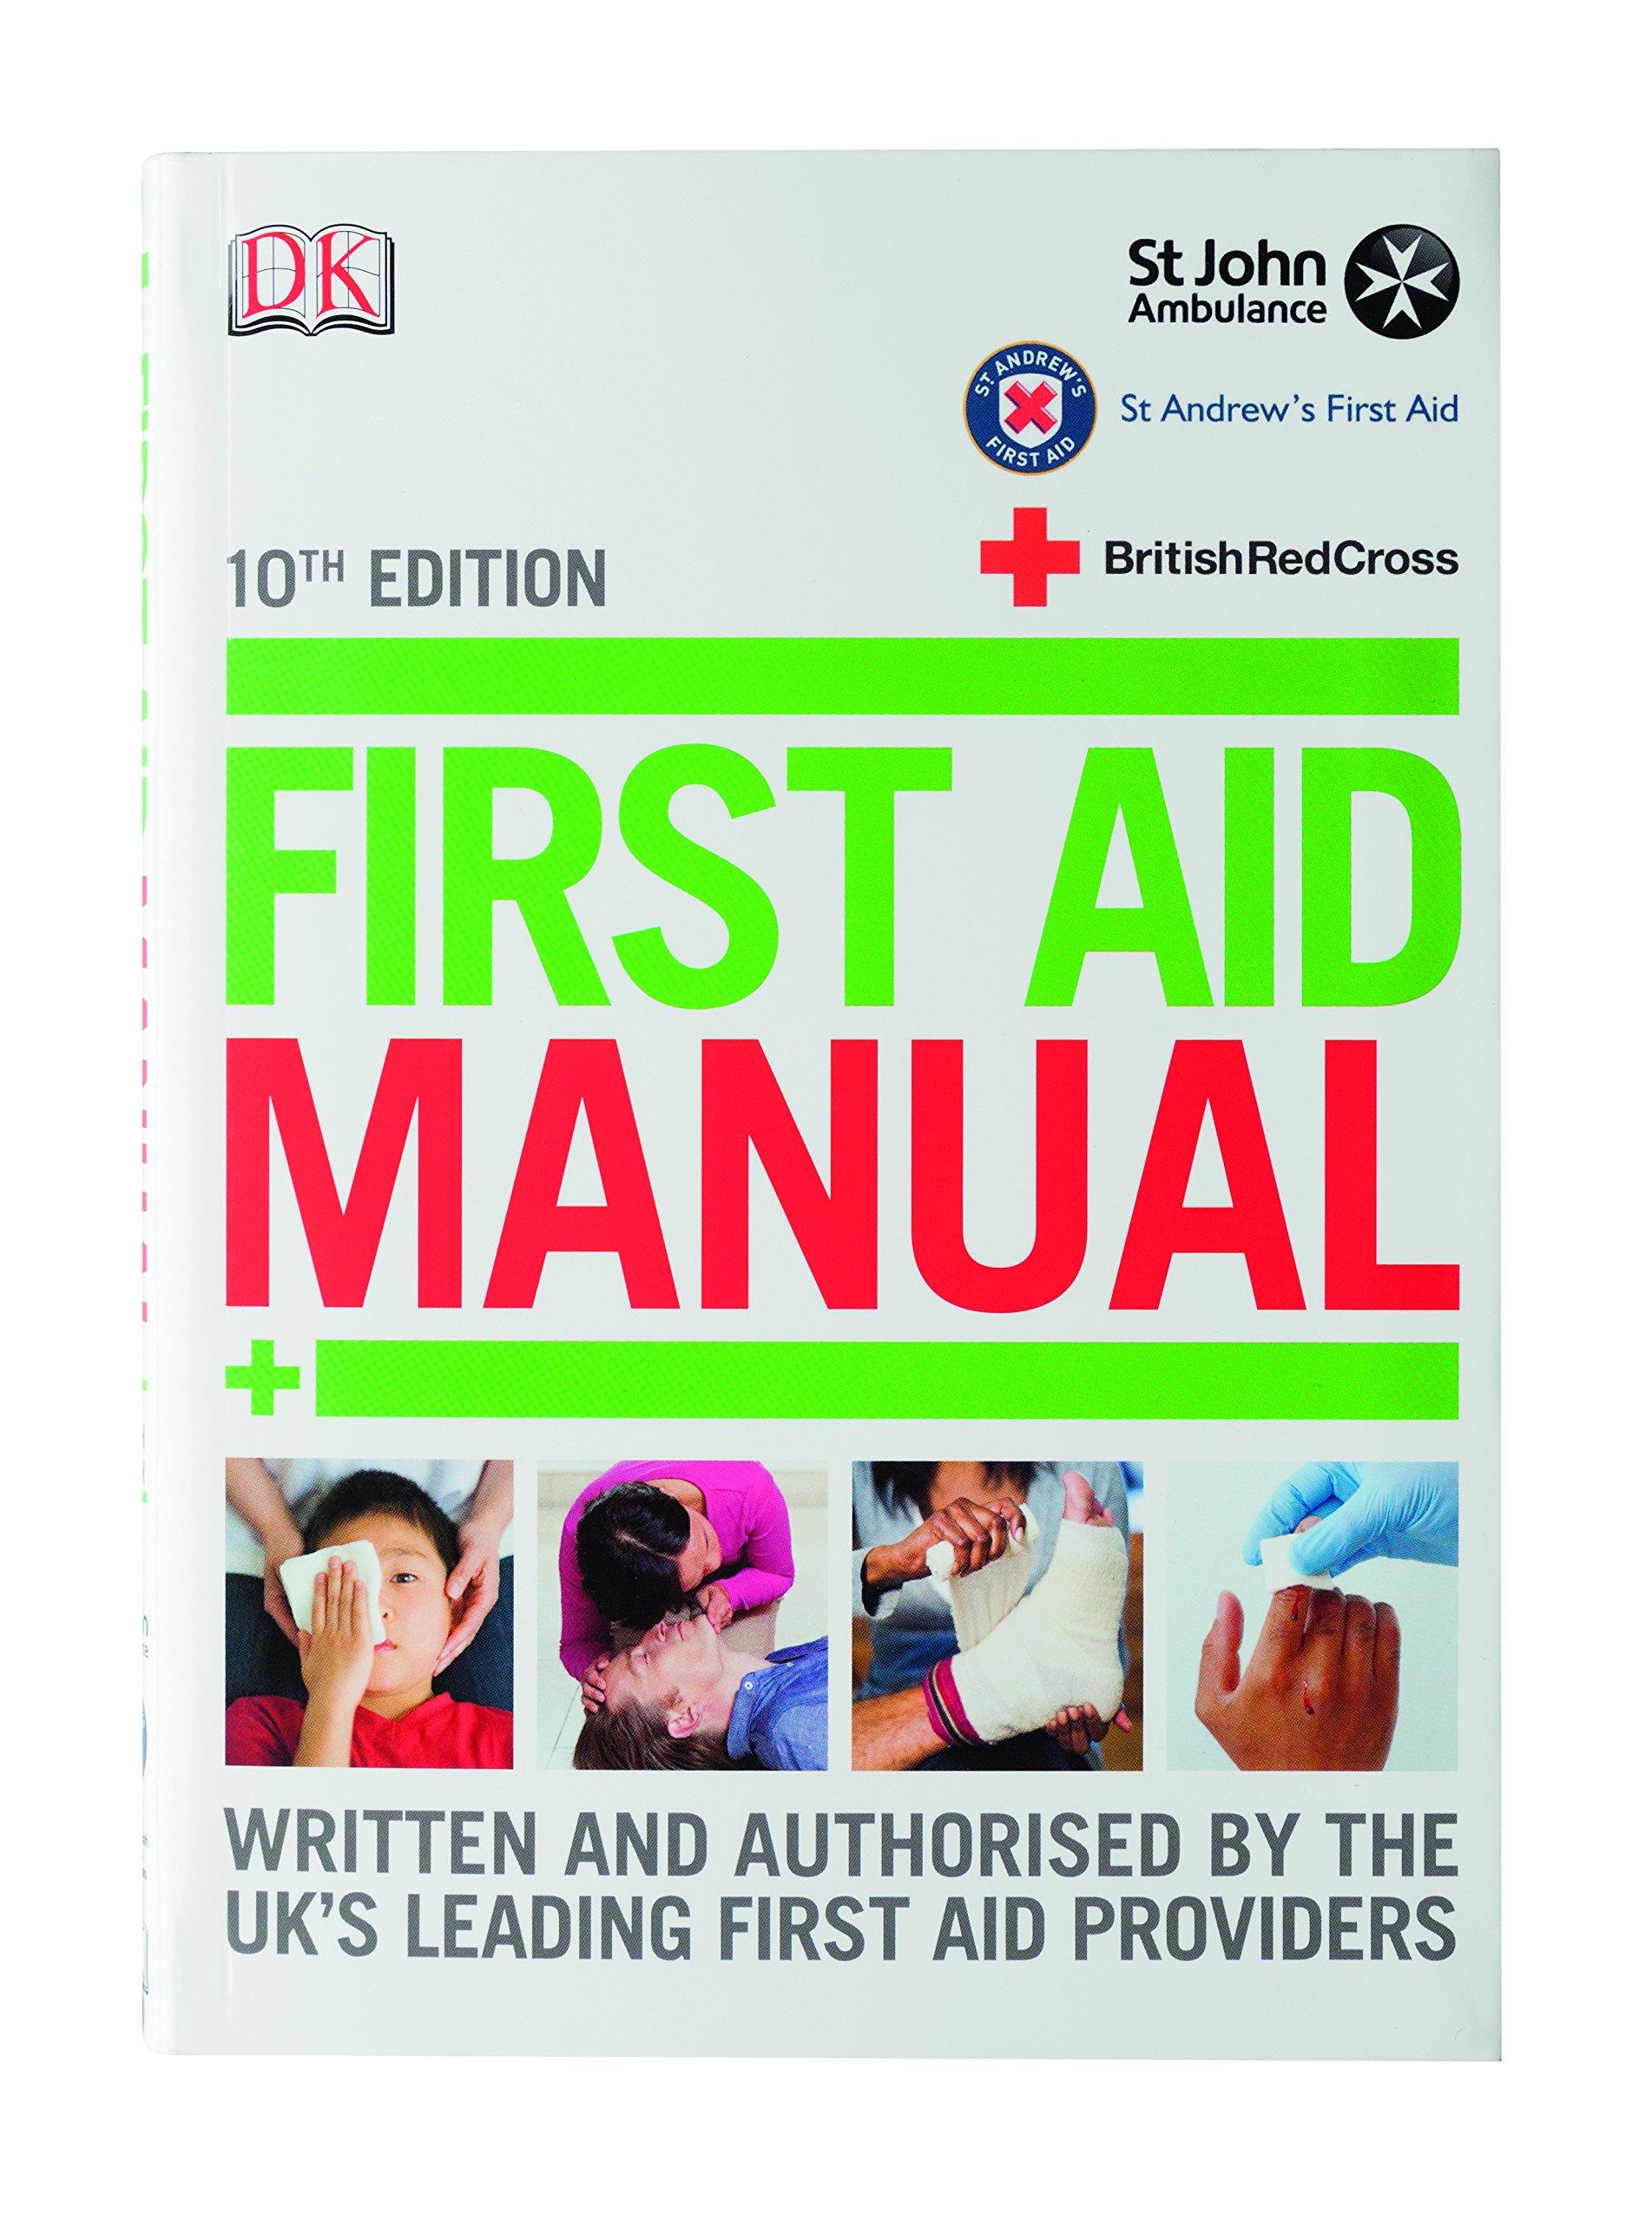 St John Ambulance 10th Edition First Aid Manual: Amazon.co.uk: St. John  Ambulance; St. Andrew's Ambulance Association; The British Red Cross So:  Books